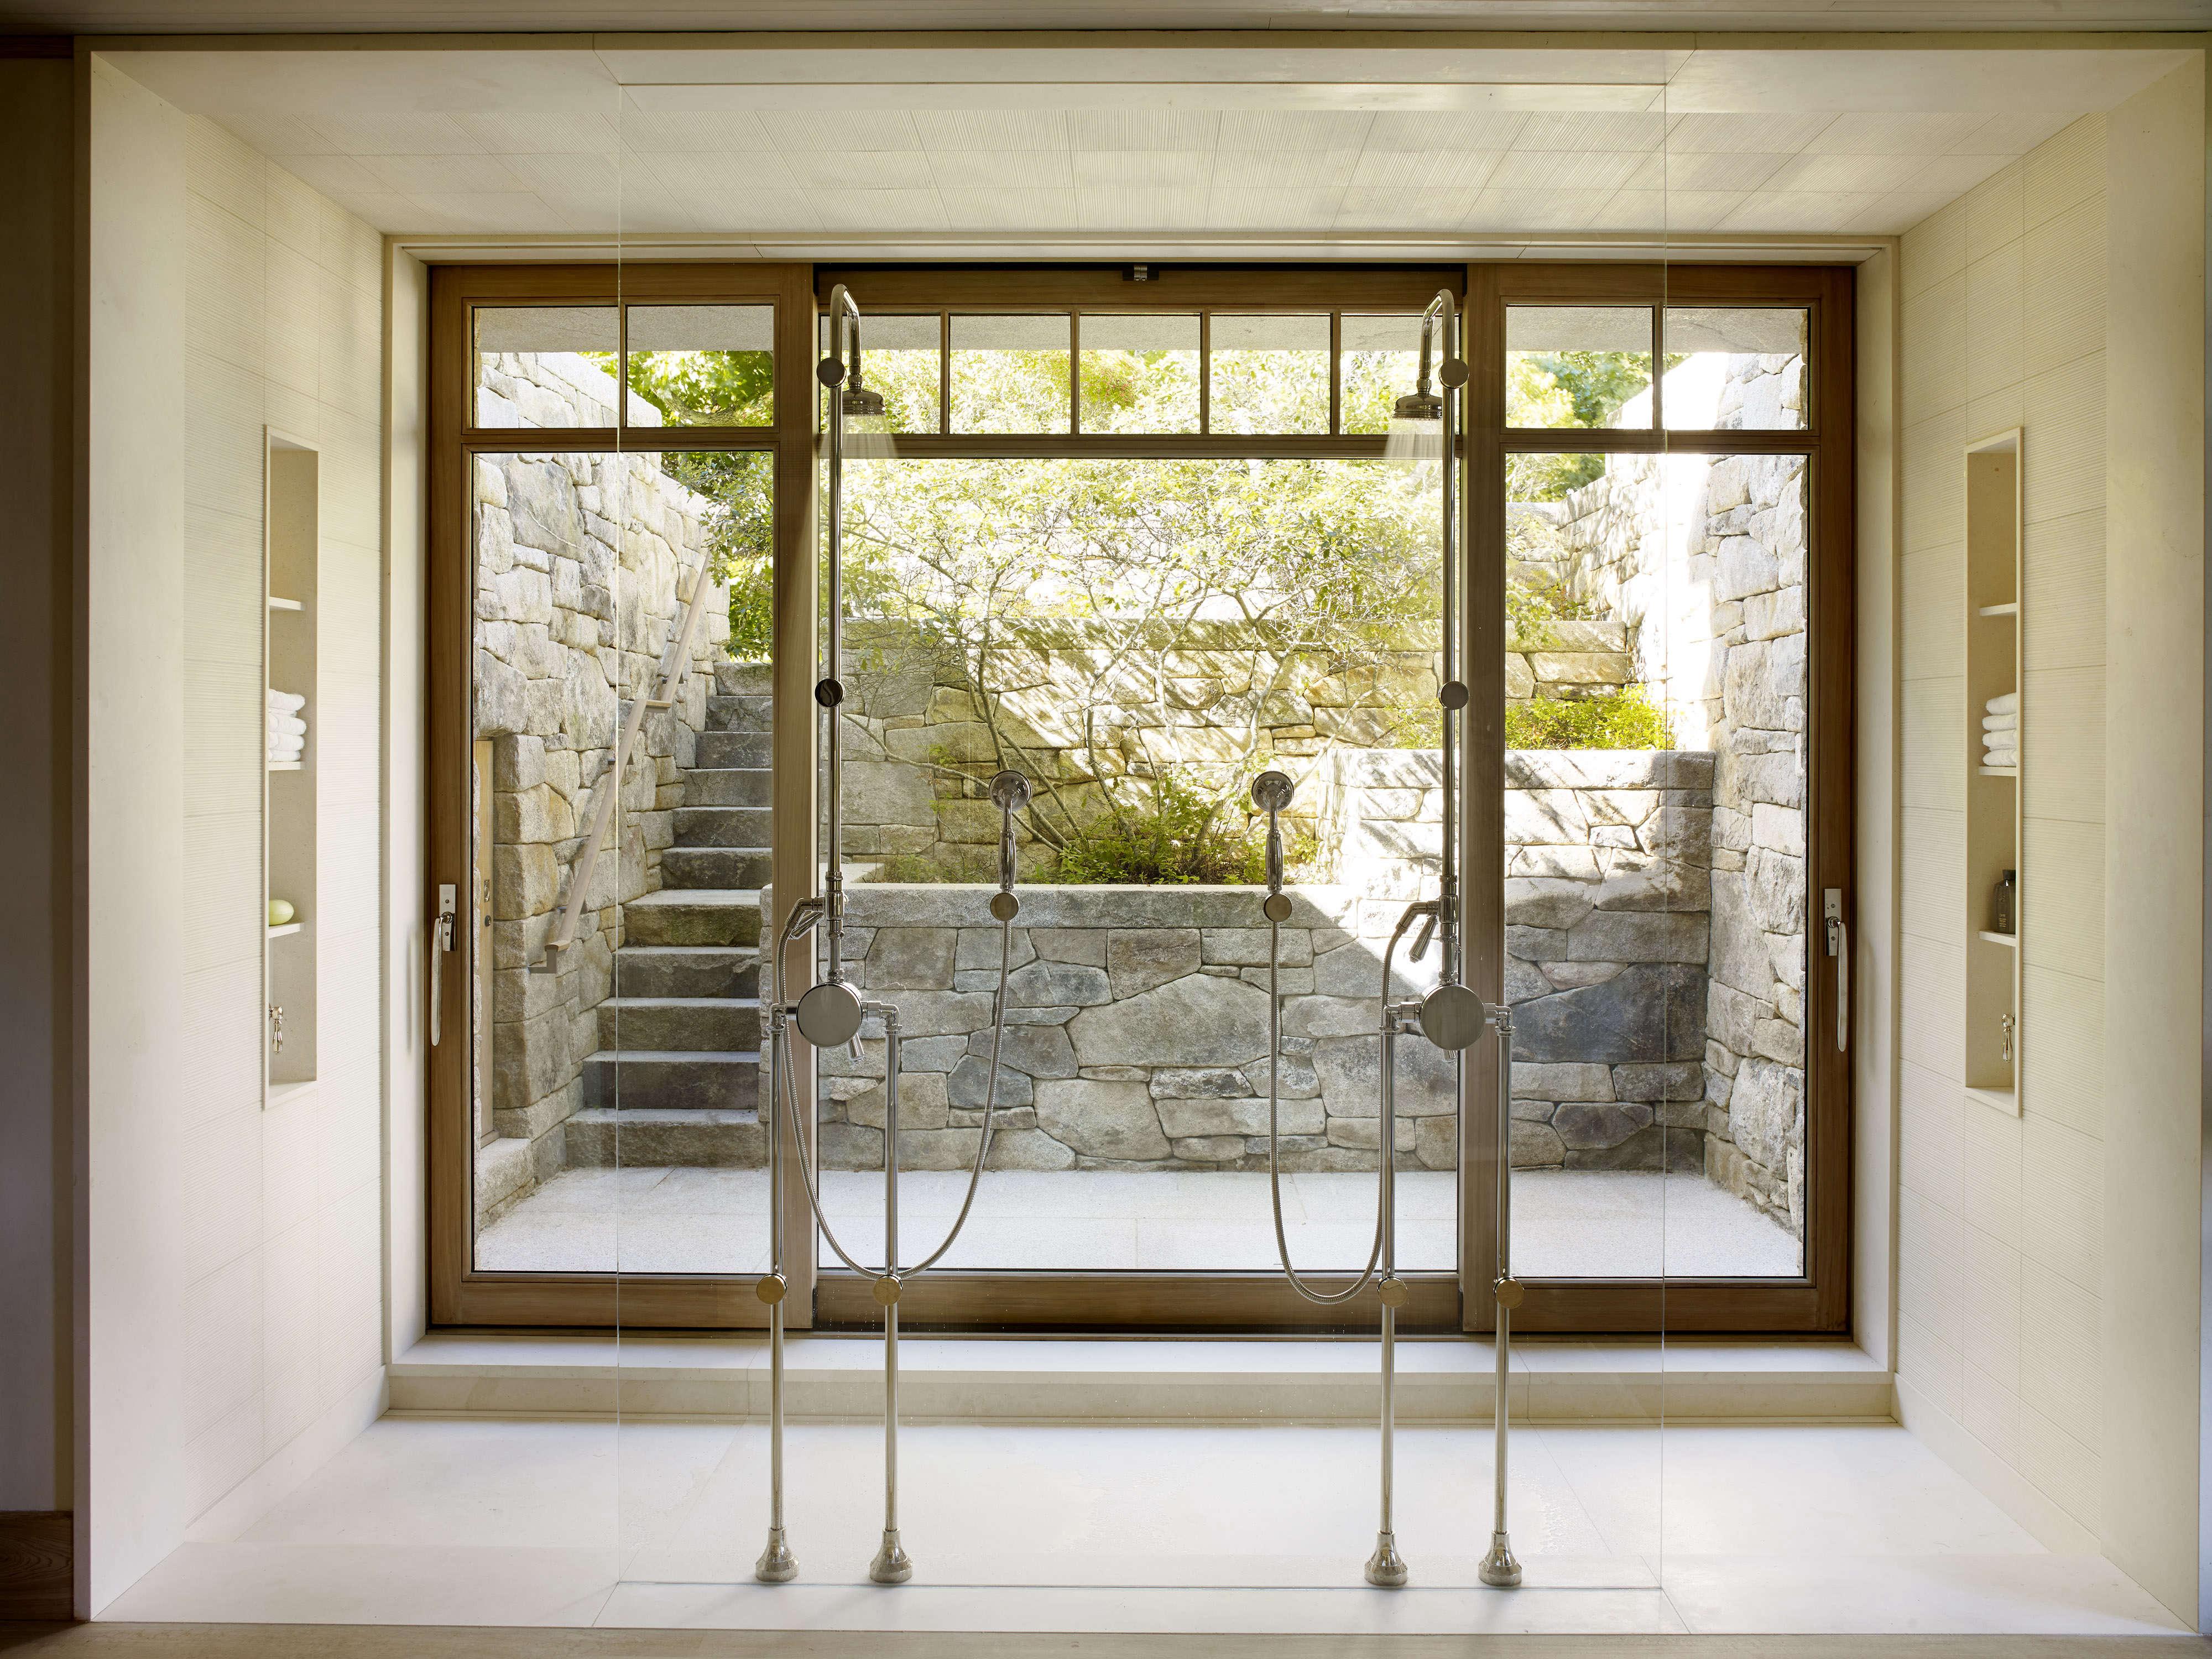 shower-opens-onto-backyard-greenery-light-open